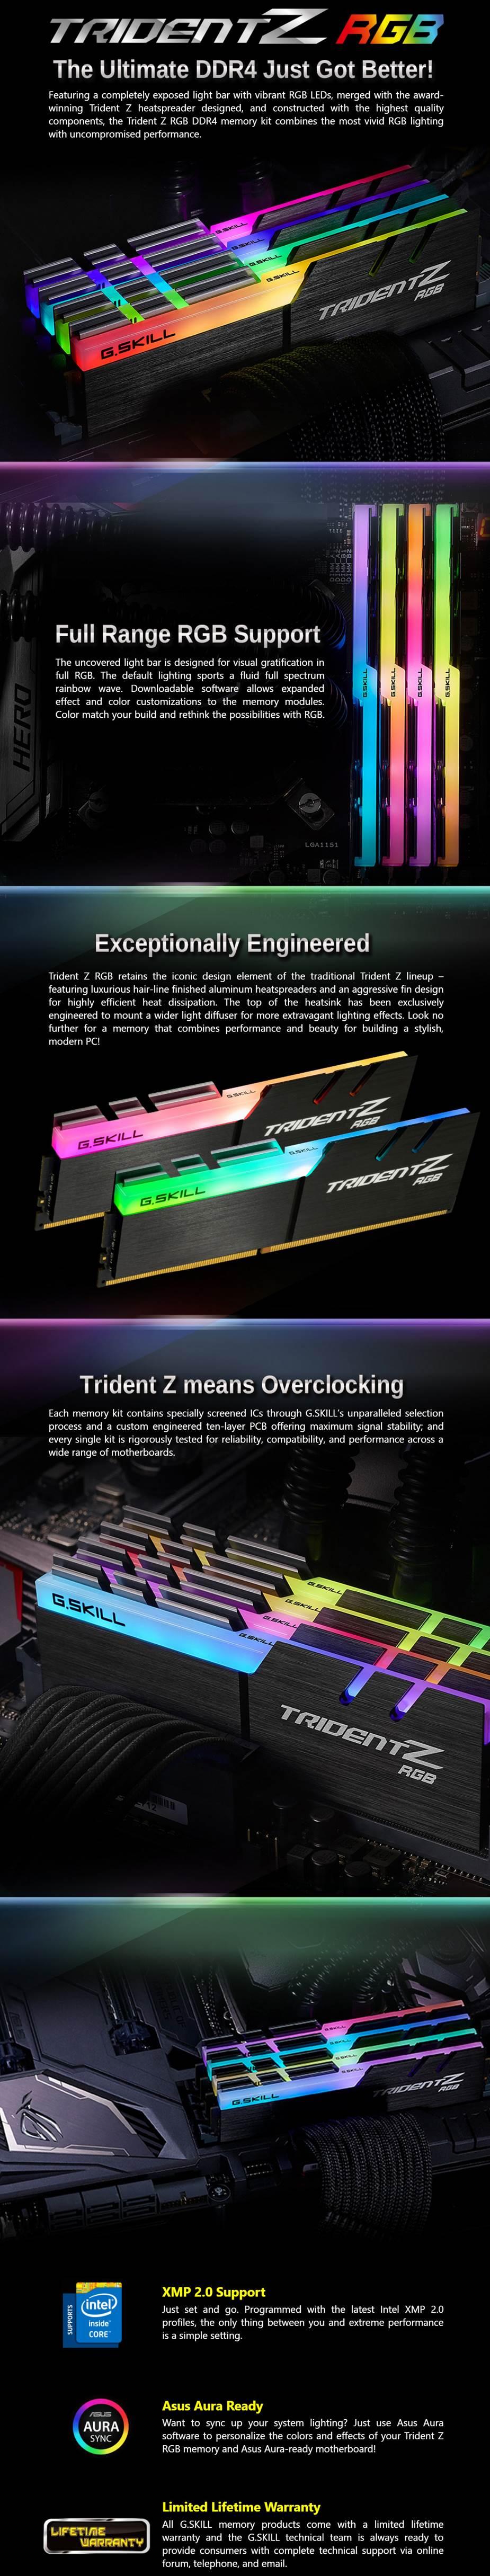 G Skill Trident Z RGB 32GB (2x 16GB) DDR4 3600Mhz Memory